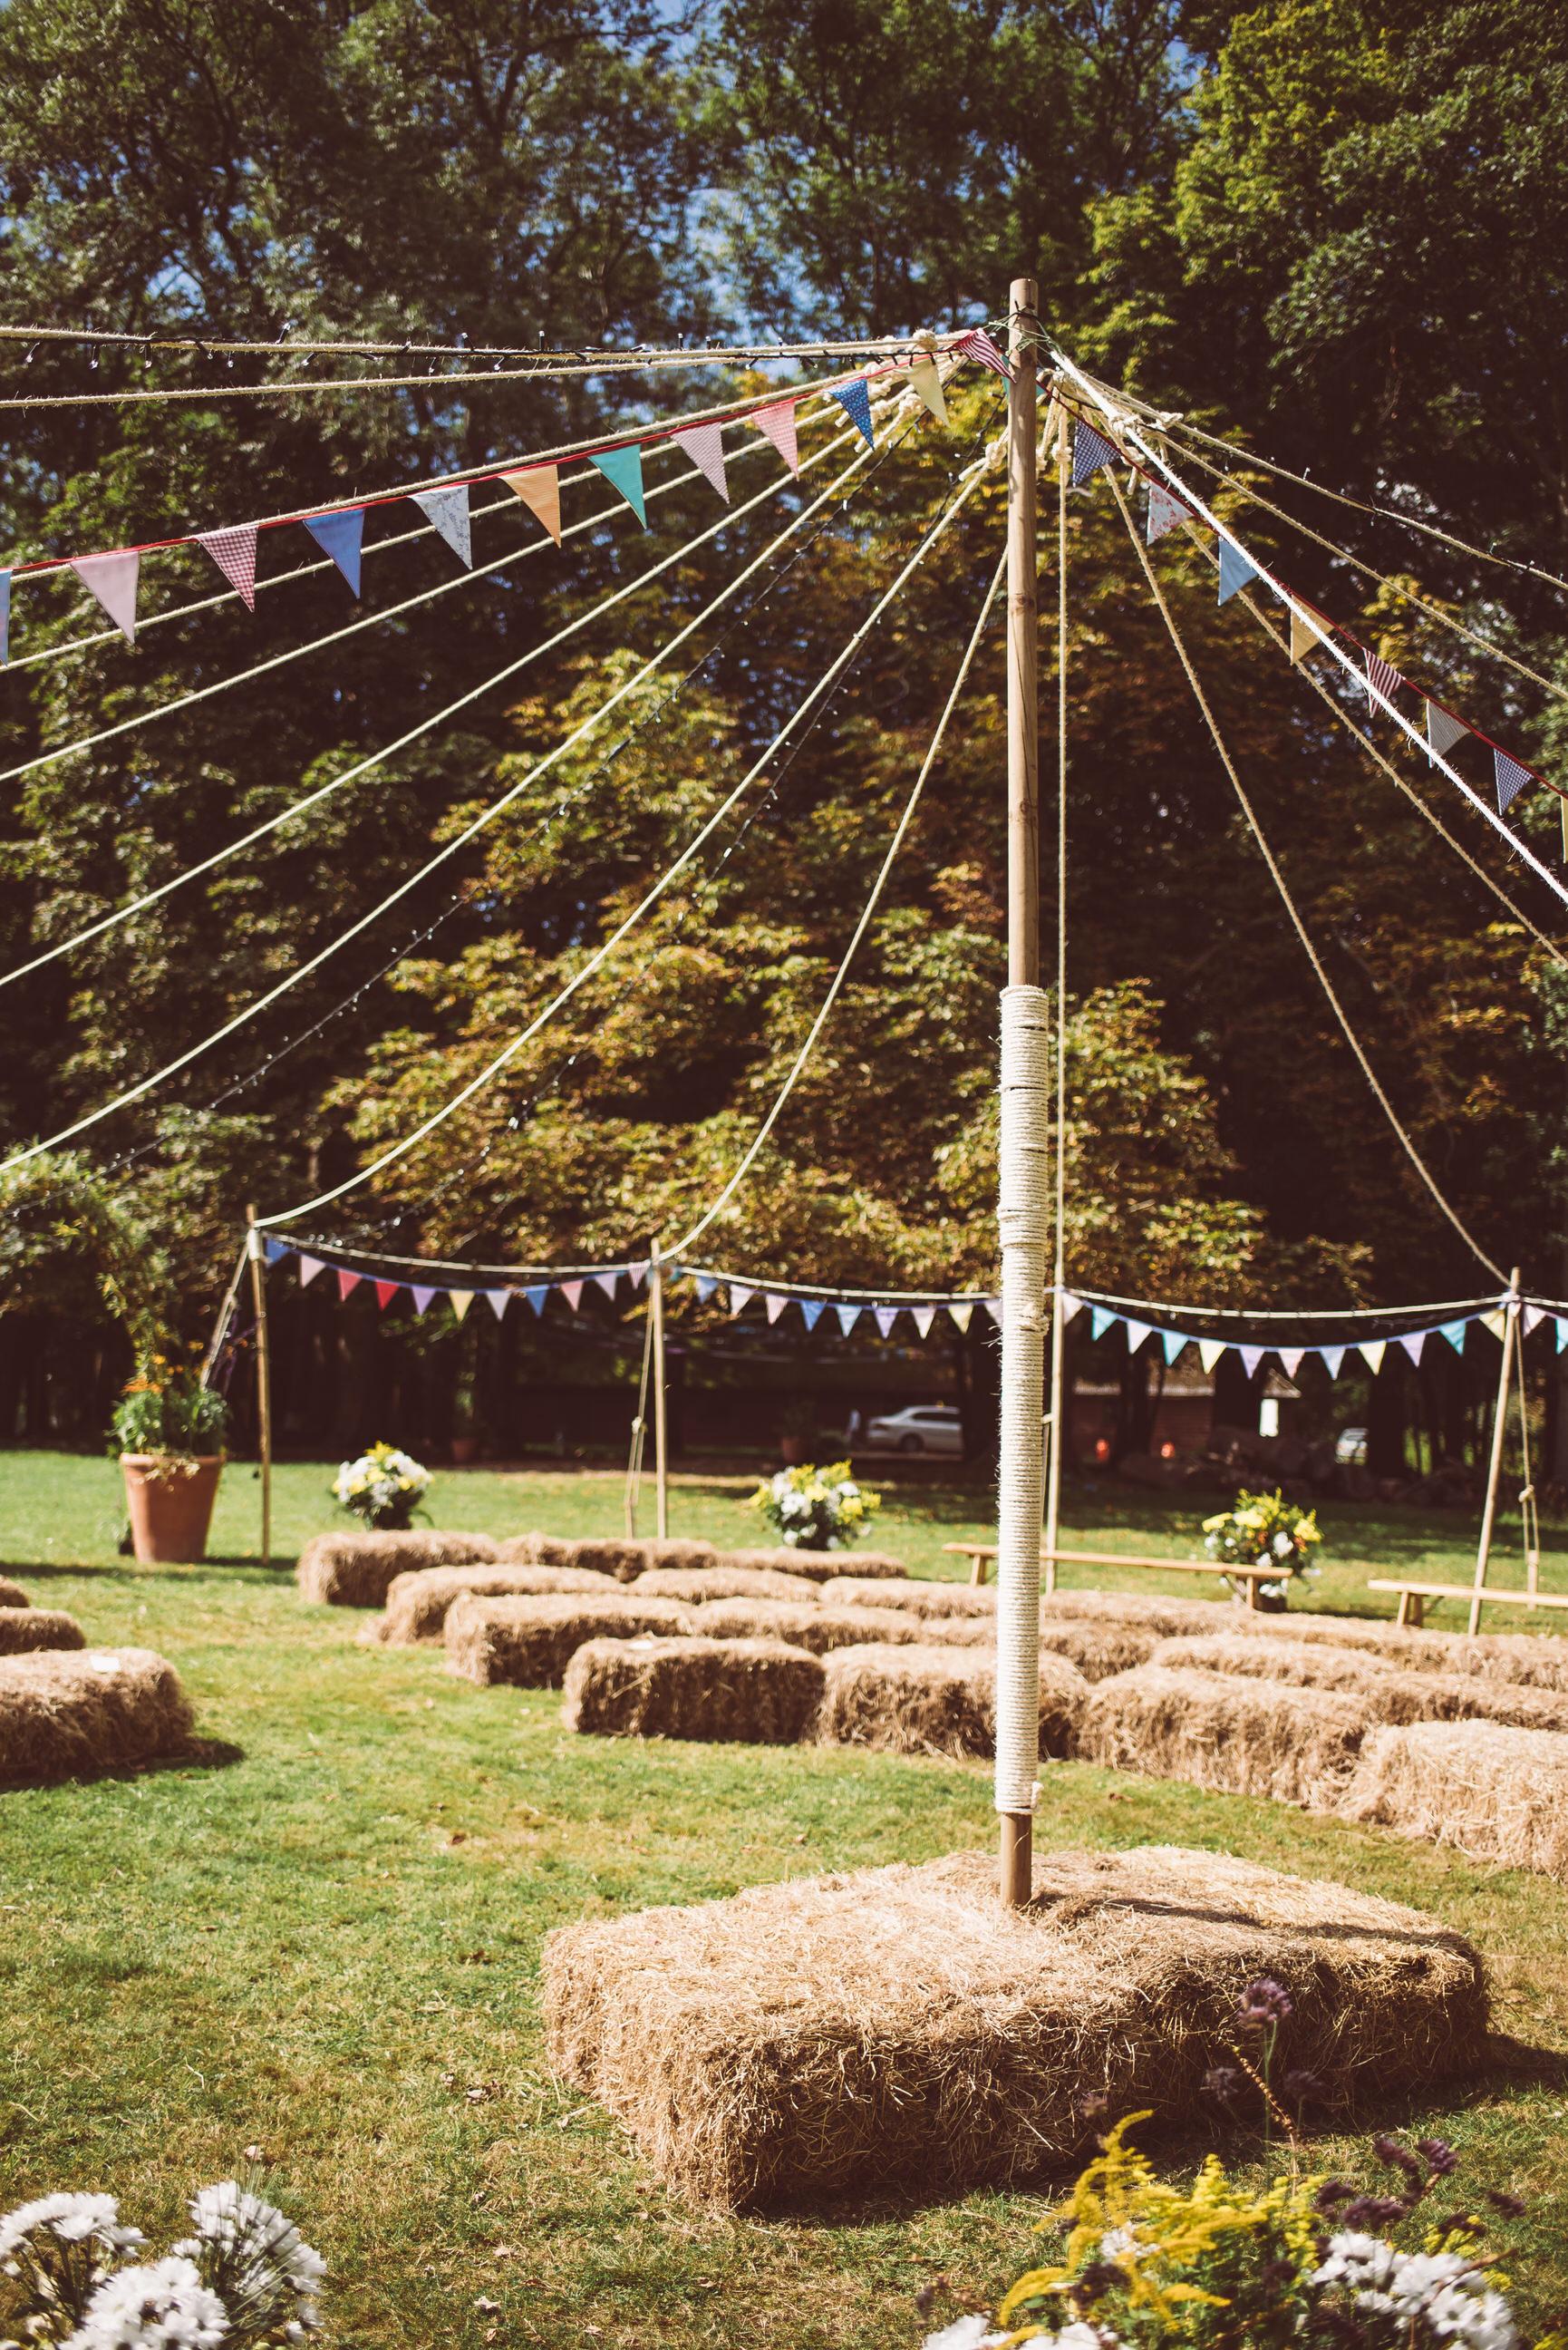 knepp-castle-boho-outdoor-wedding-11.jpg